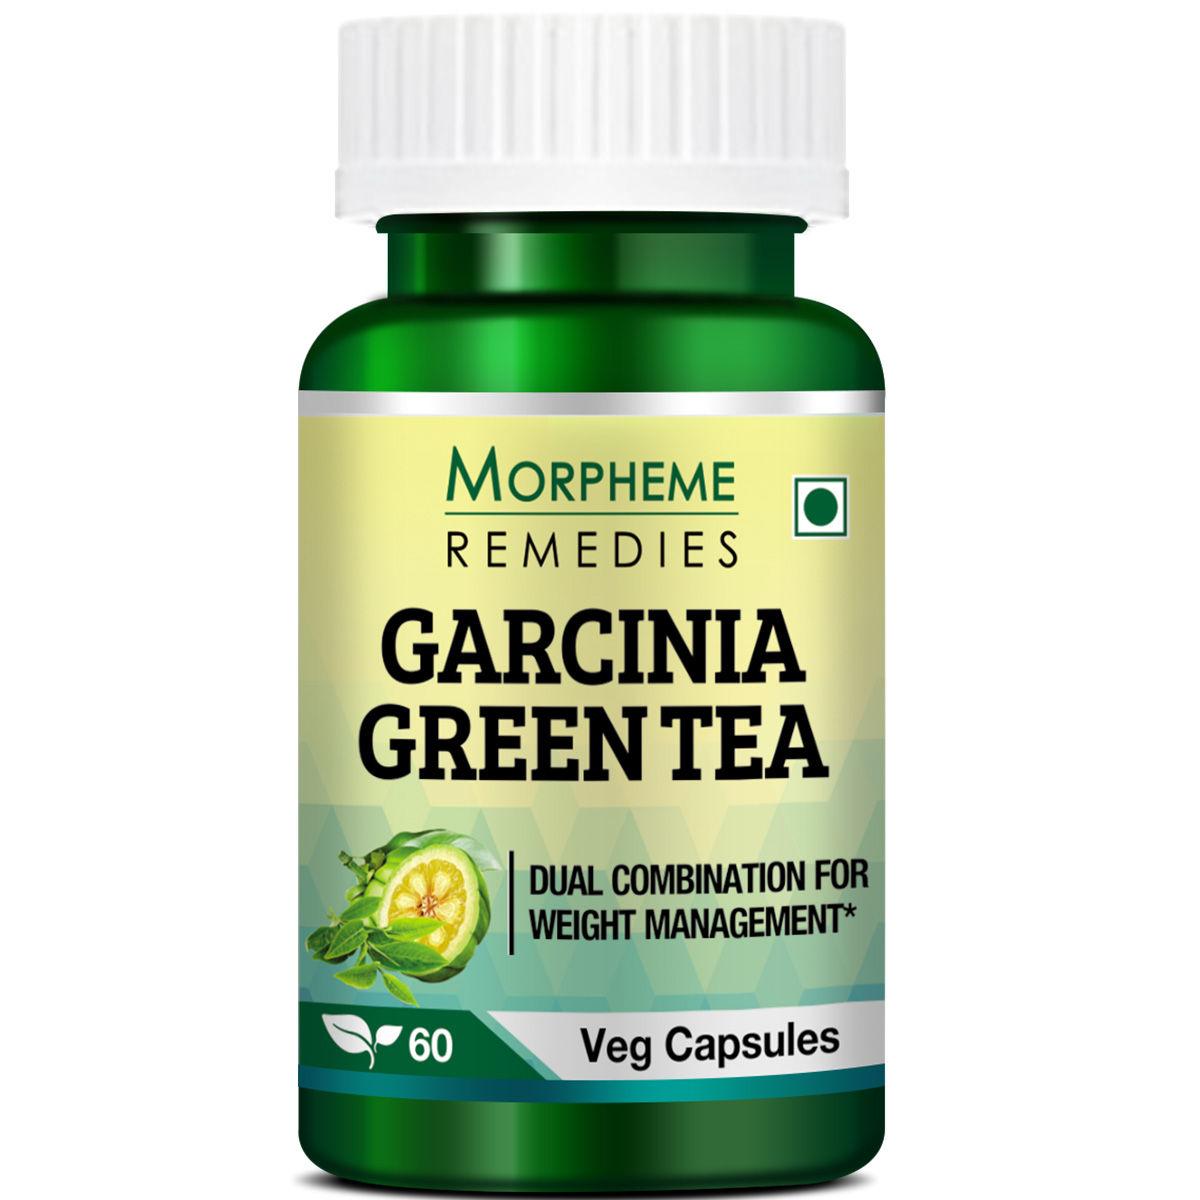 Morpheme Remedies Garcinia Cambogia Green Tea - Fat Burner Supplements - 500mg Extract